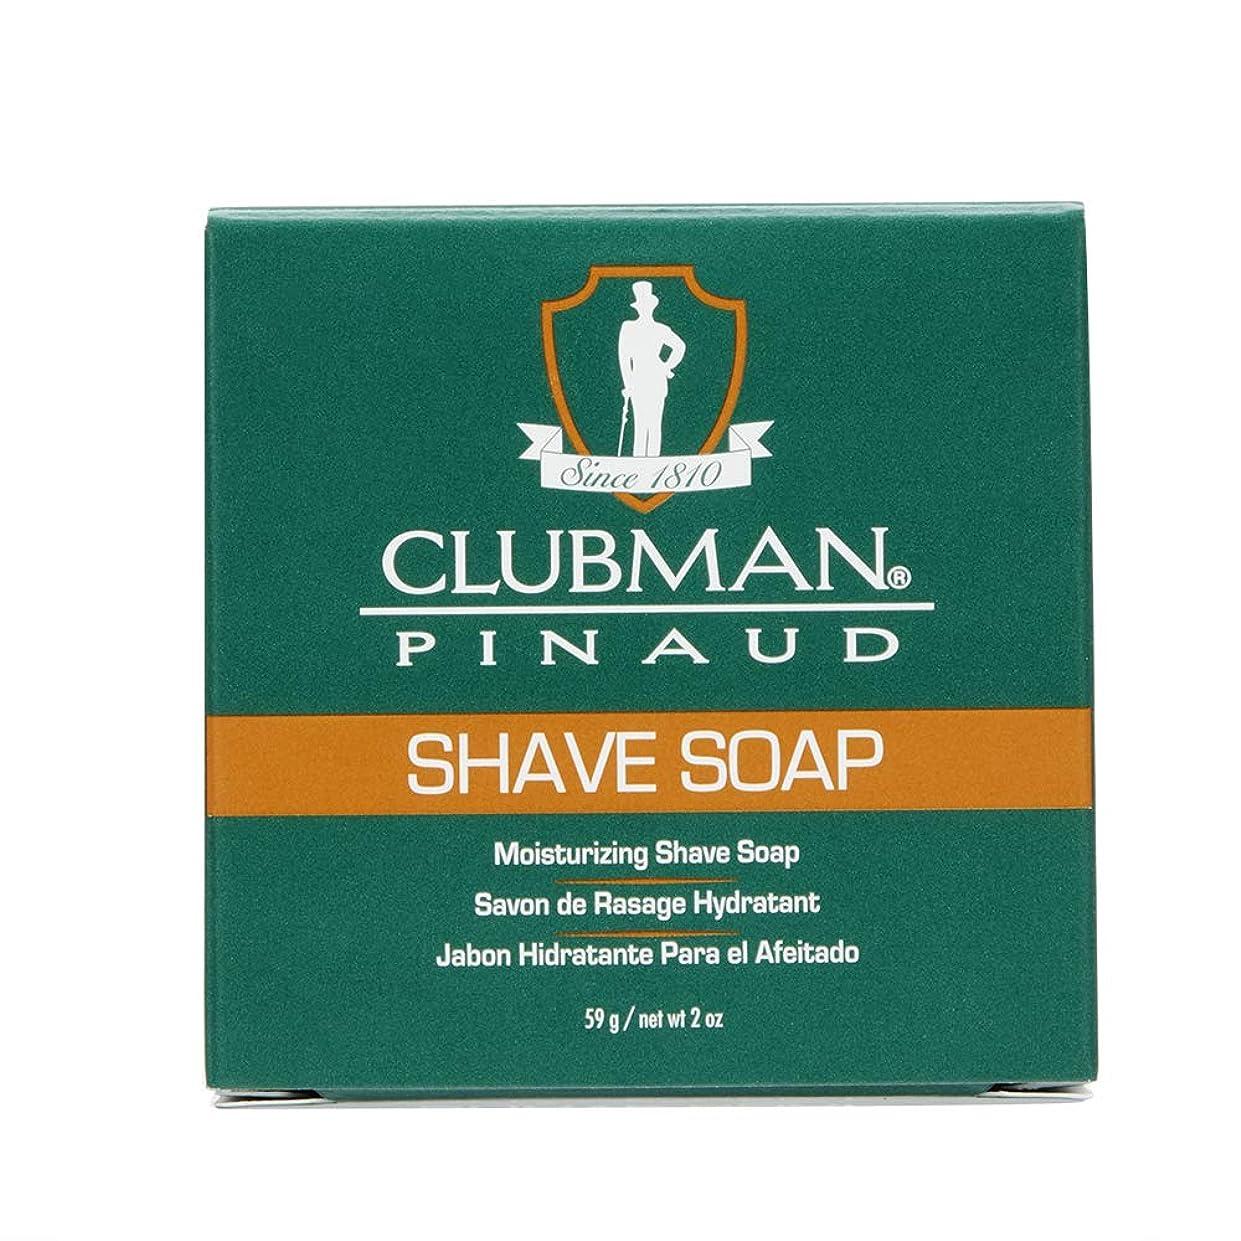 CLUBMAN Shave Soap (並行輸入品)